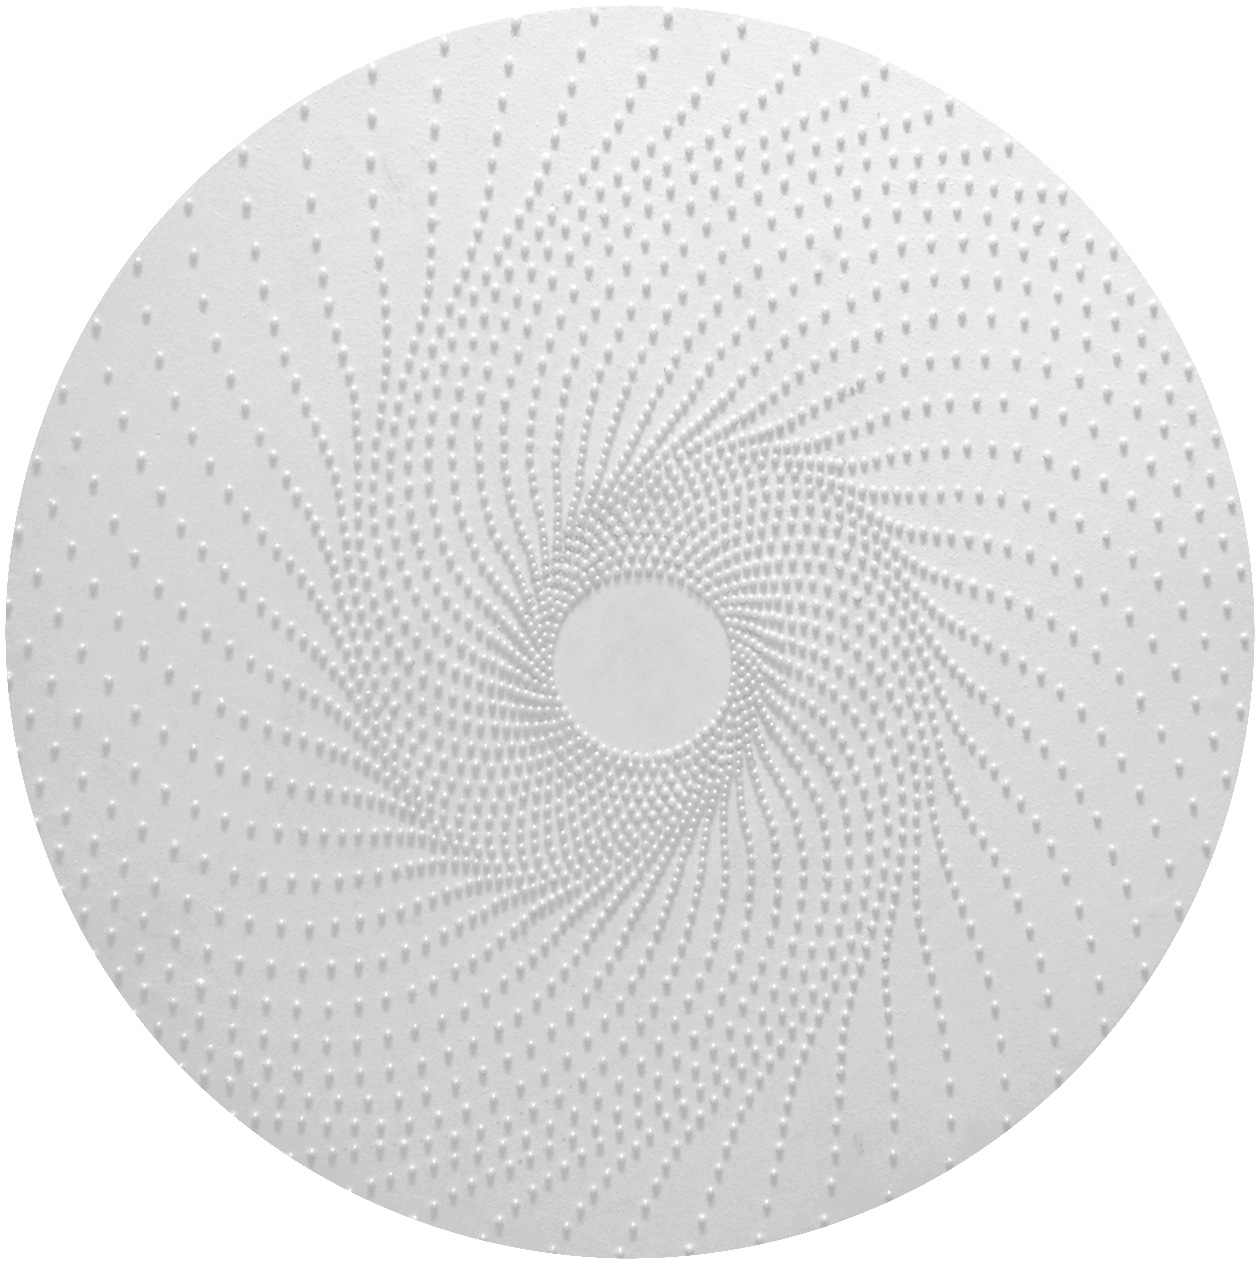 Vortex II 60cm